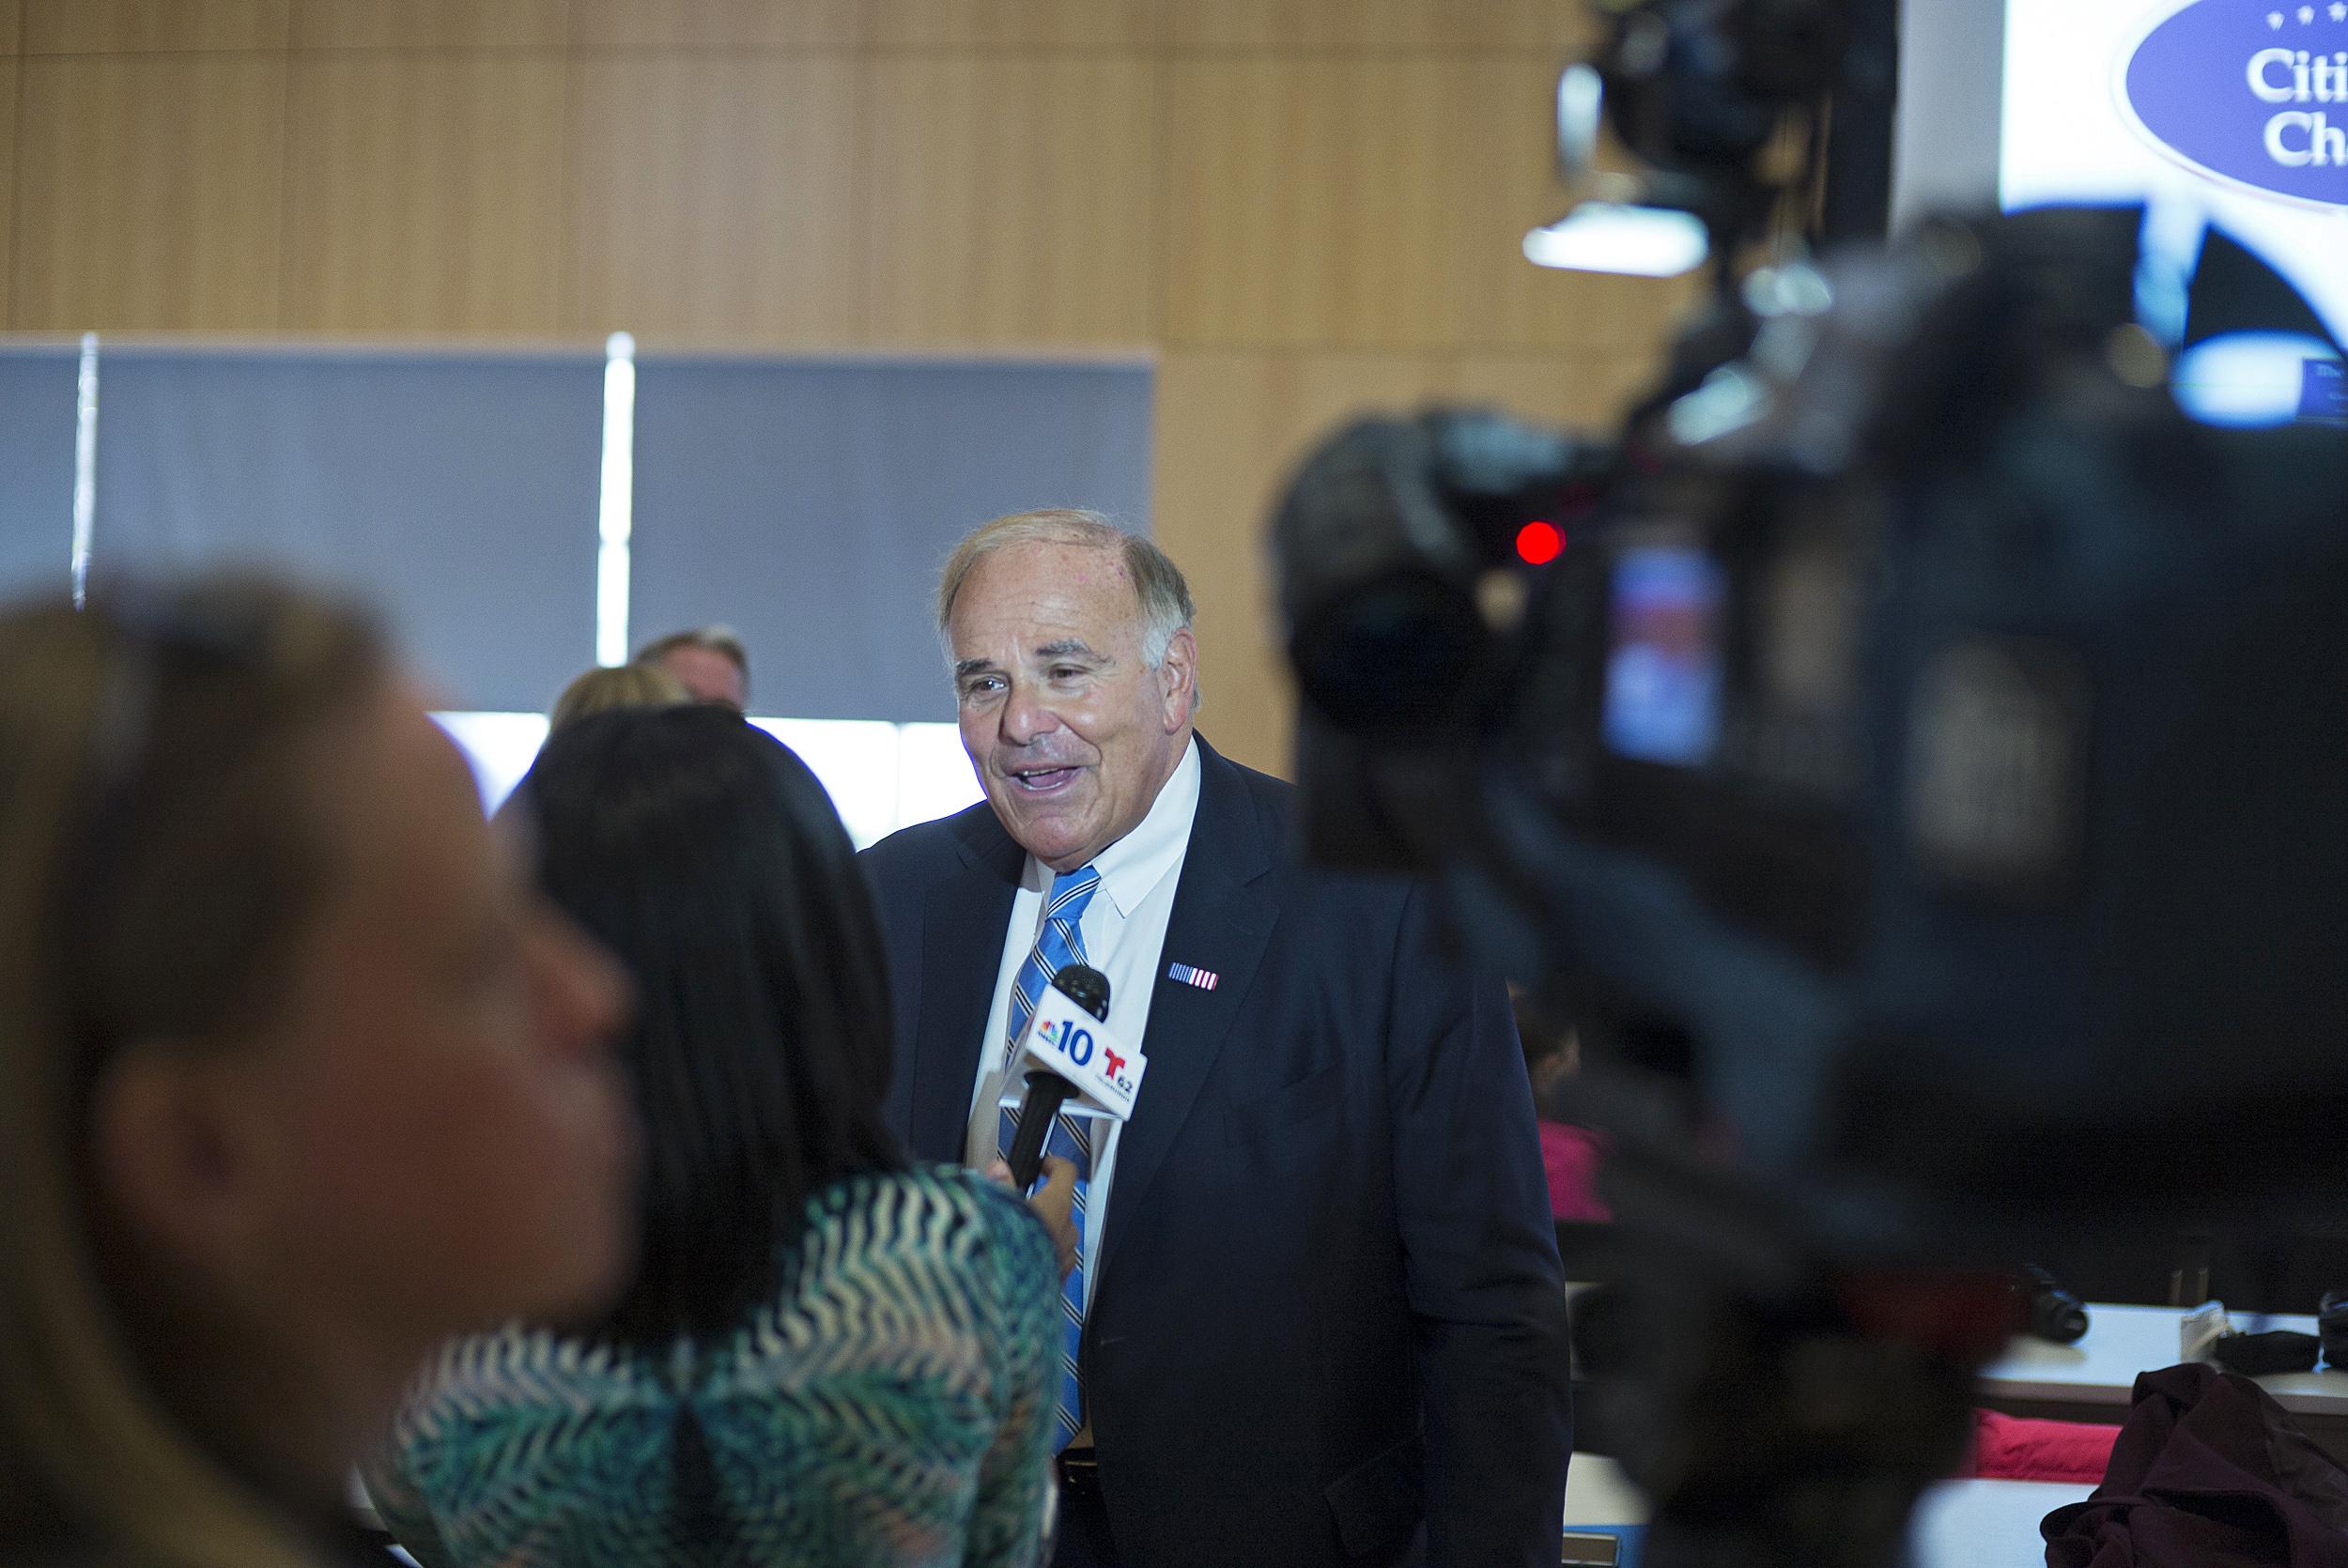 Former Gov. Ed Rendell speaks with a reporter from NBC 10 Philadelphia.